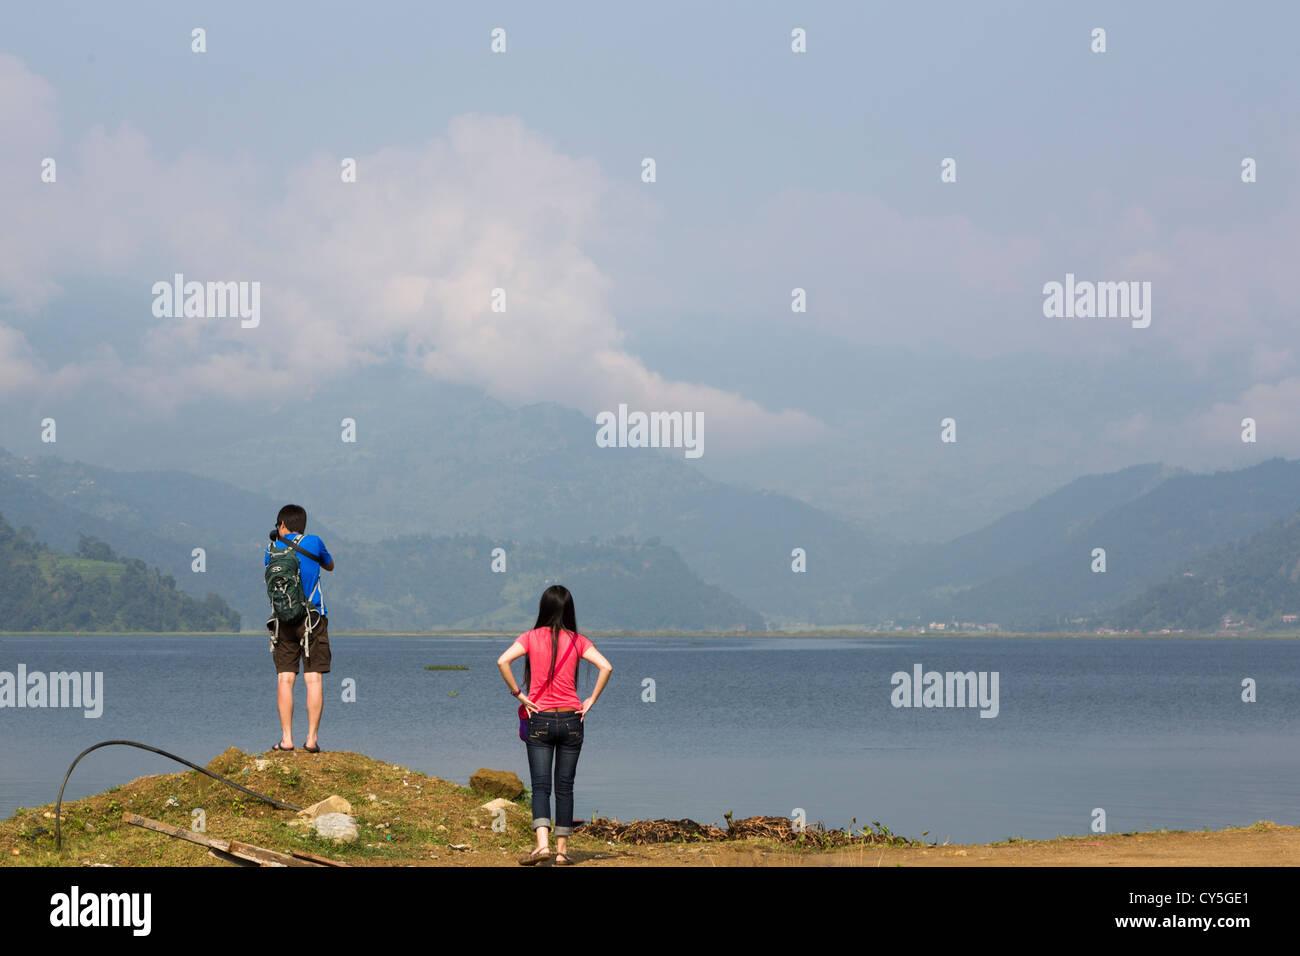 2 tourists enjoy the view of Phewa lake in Pokhara, Nepal - Stock Image